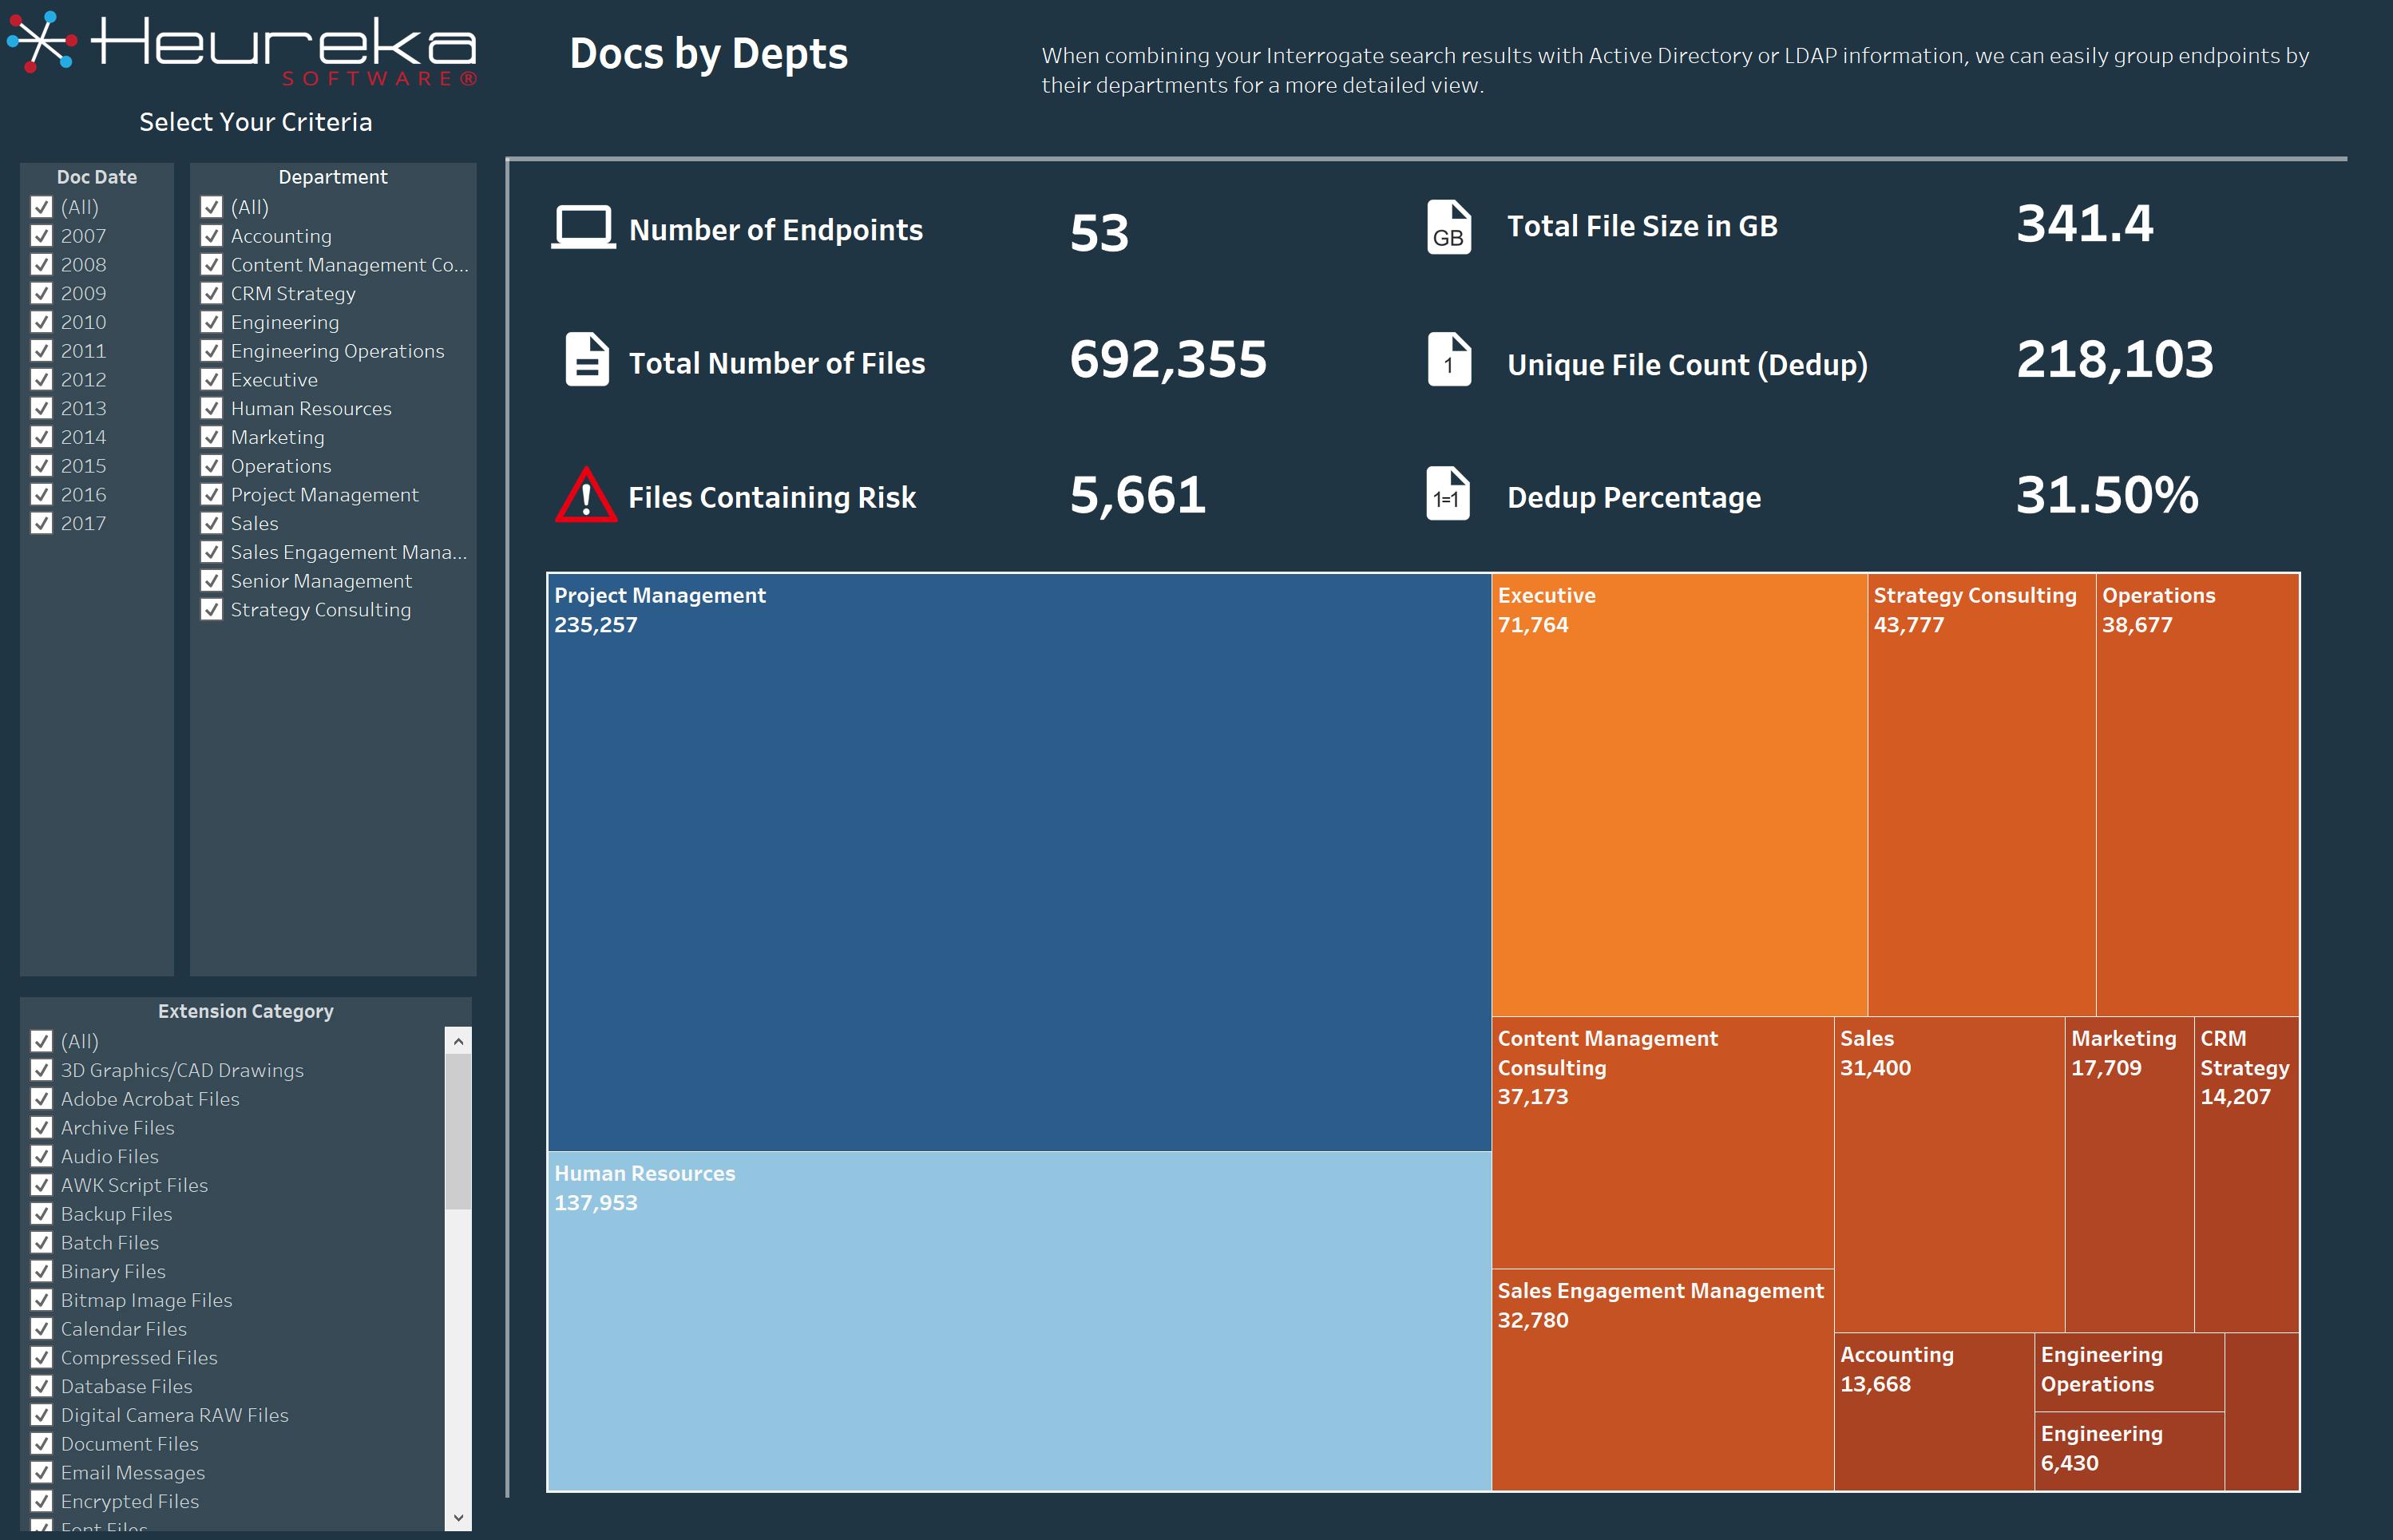 Heureka Docs by Dept Visualization